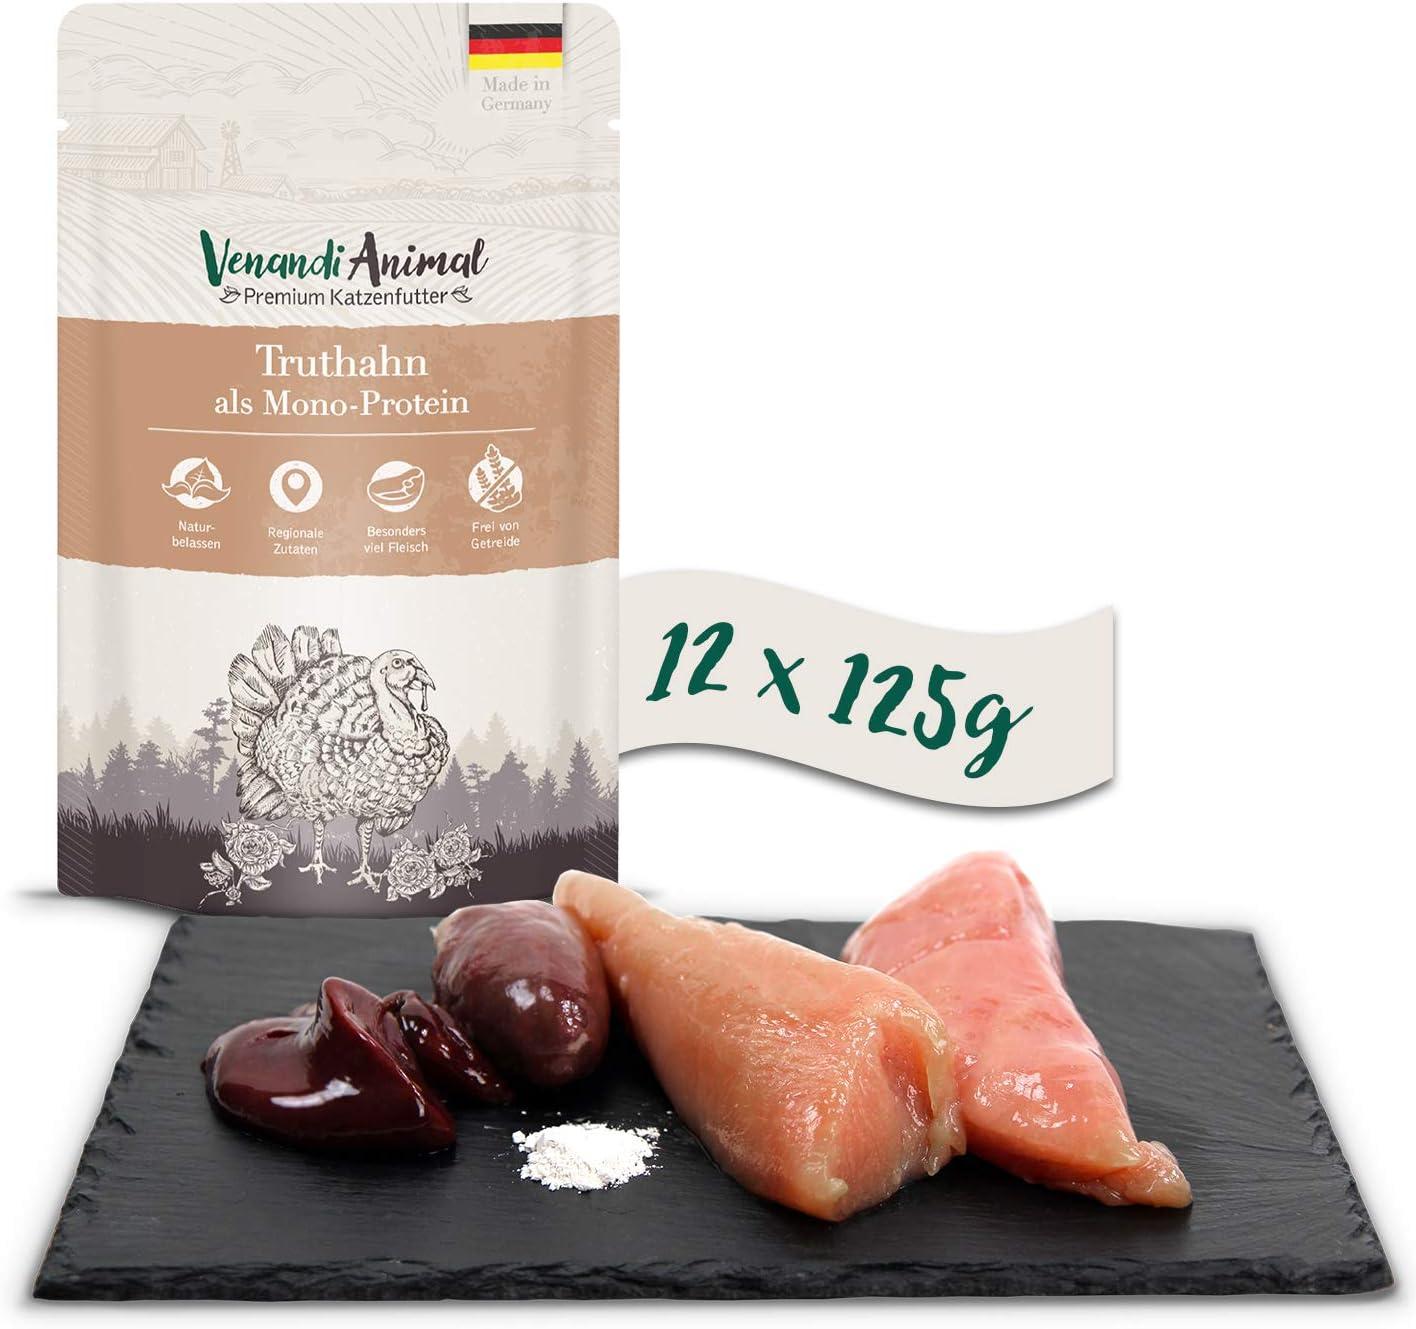 Venandi Animal - Pienso Premium para Gatos - Pavo como monoproteína - Completamente Libre de Cereales - Pouches 12 x 125 g